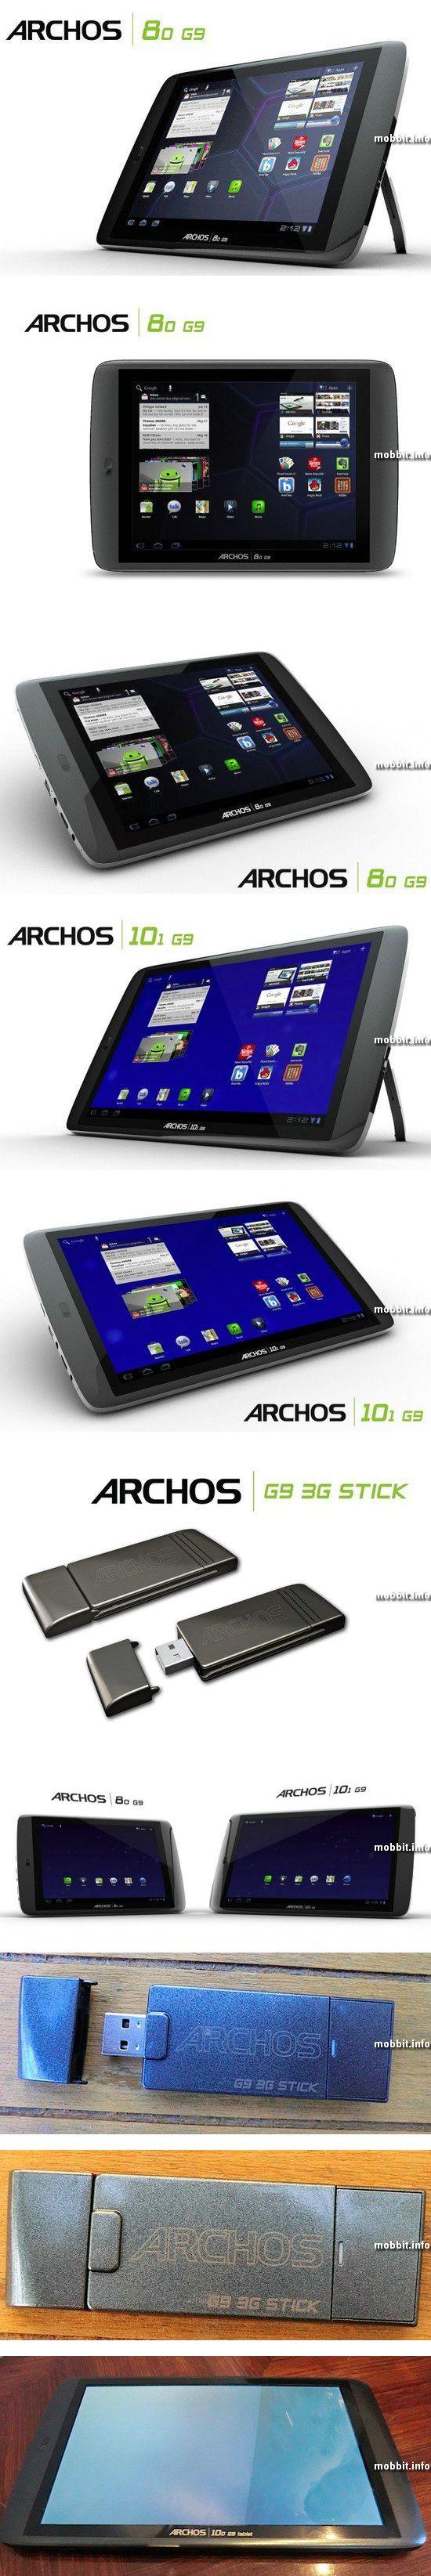 Archos 80 G9 и 101 G9